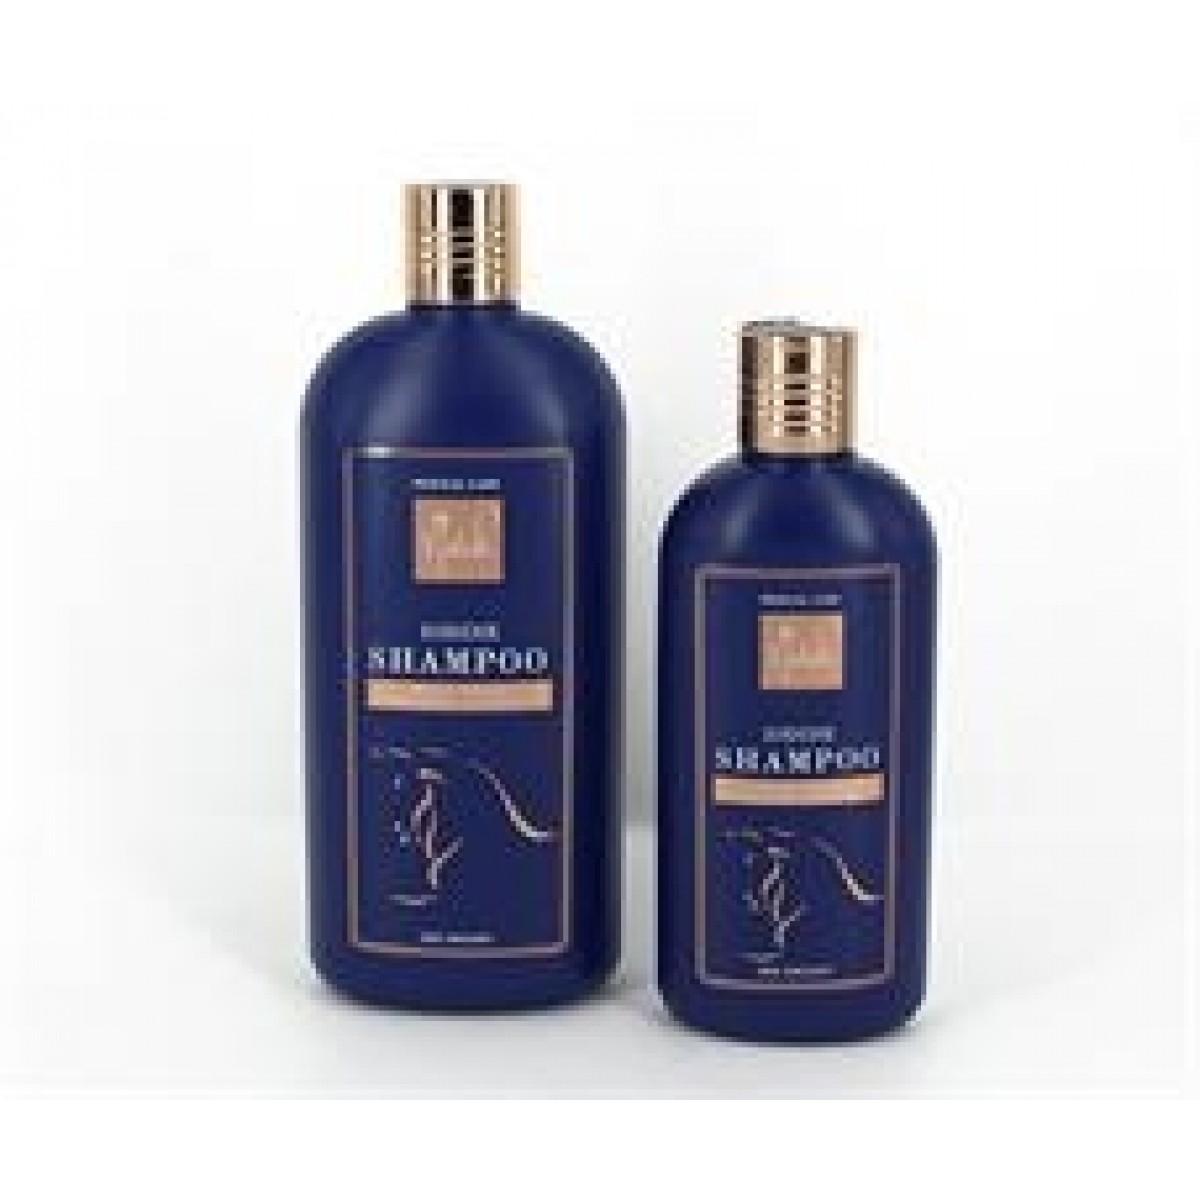 Nathalie Iodine Shampoo 400 ml